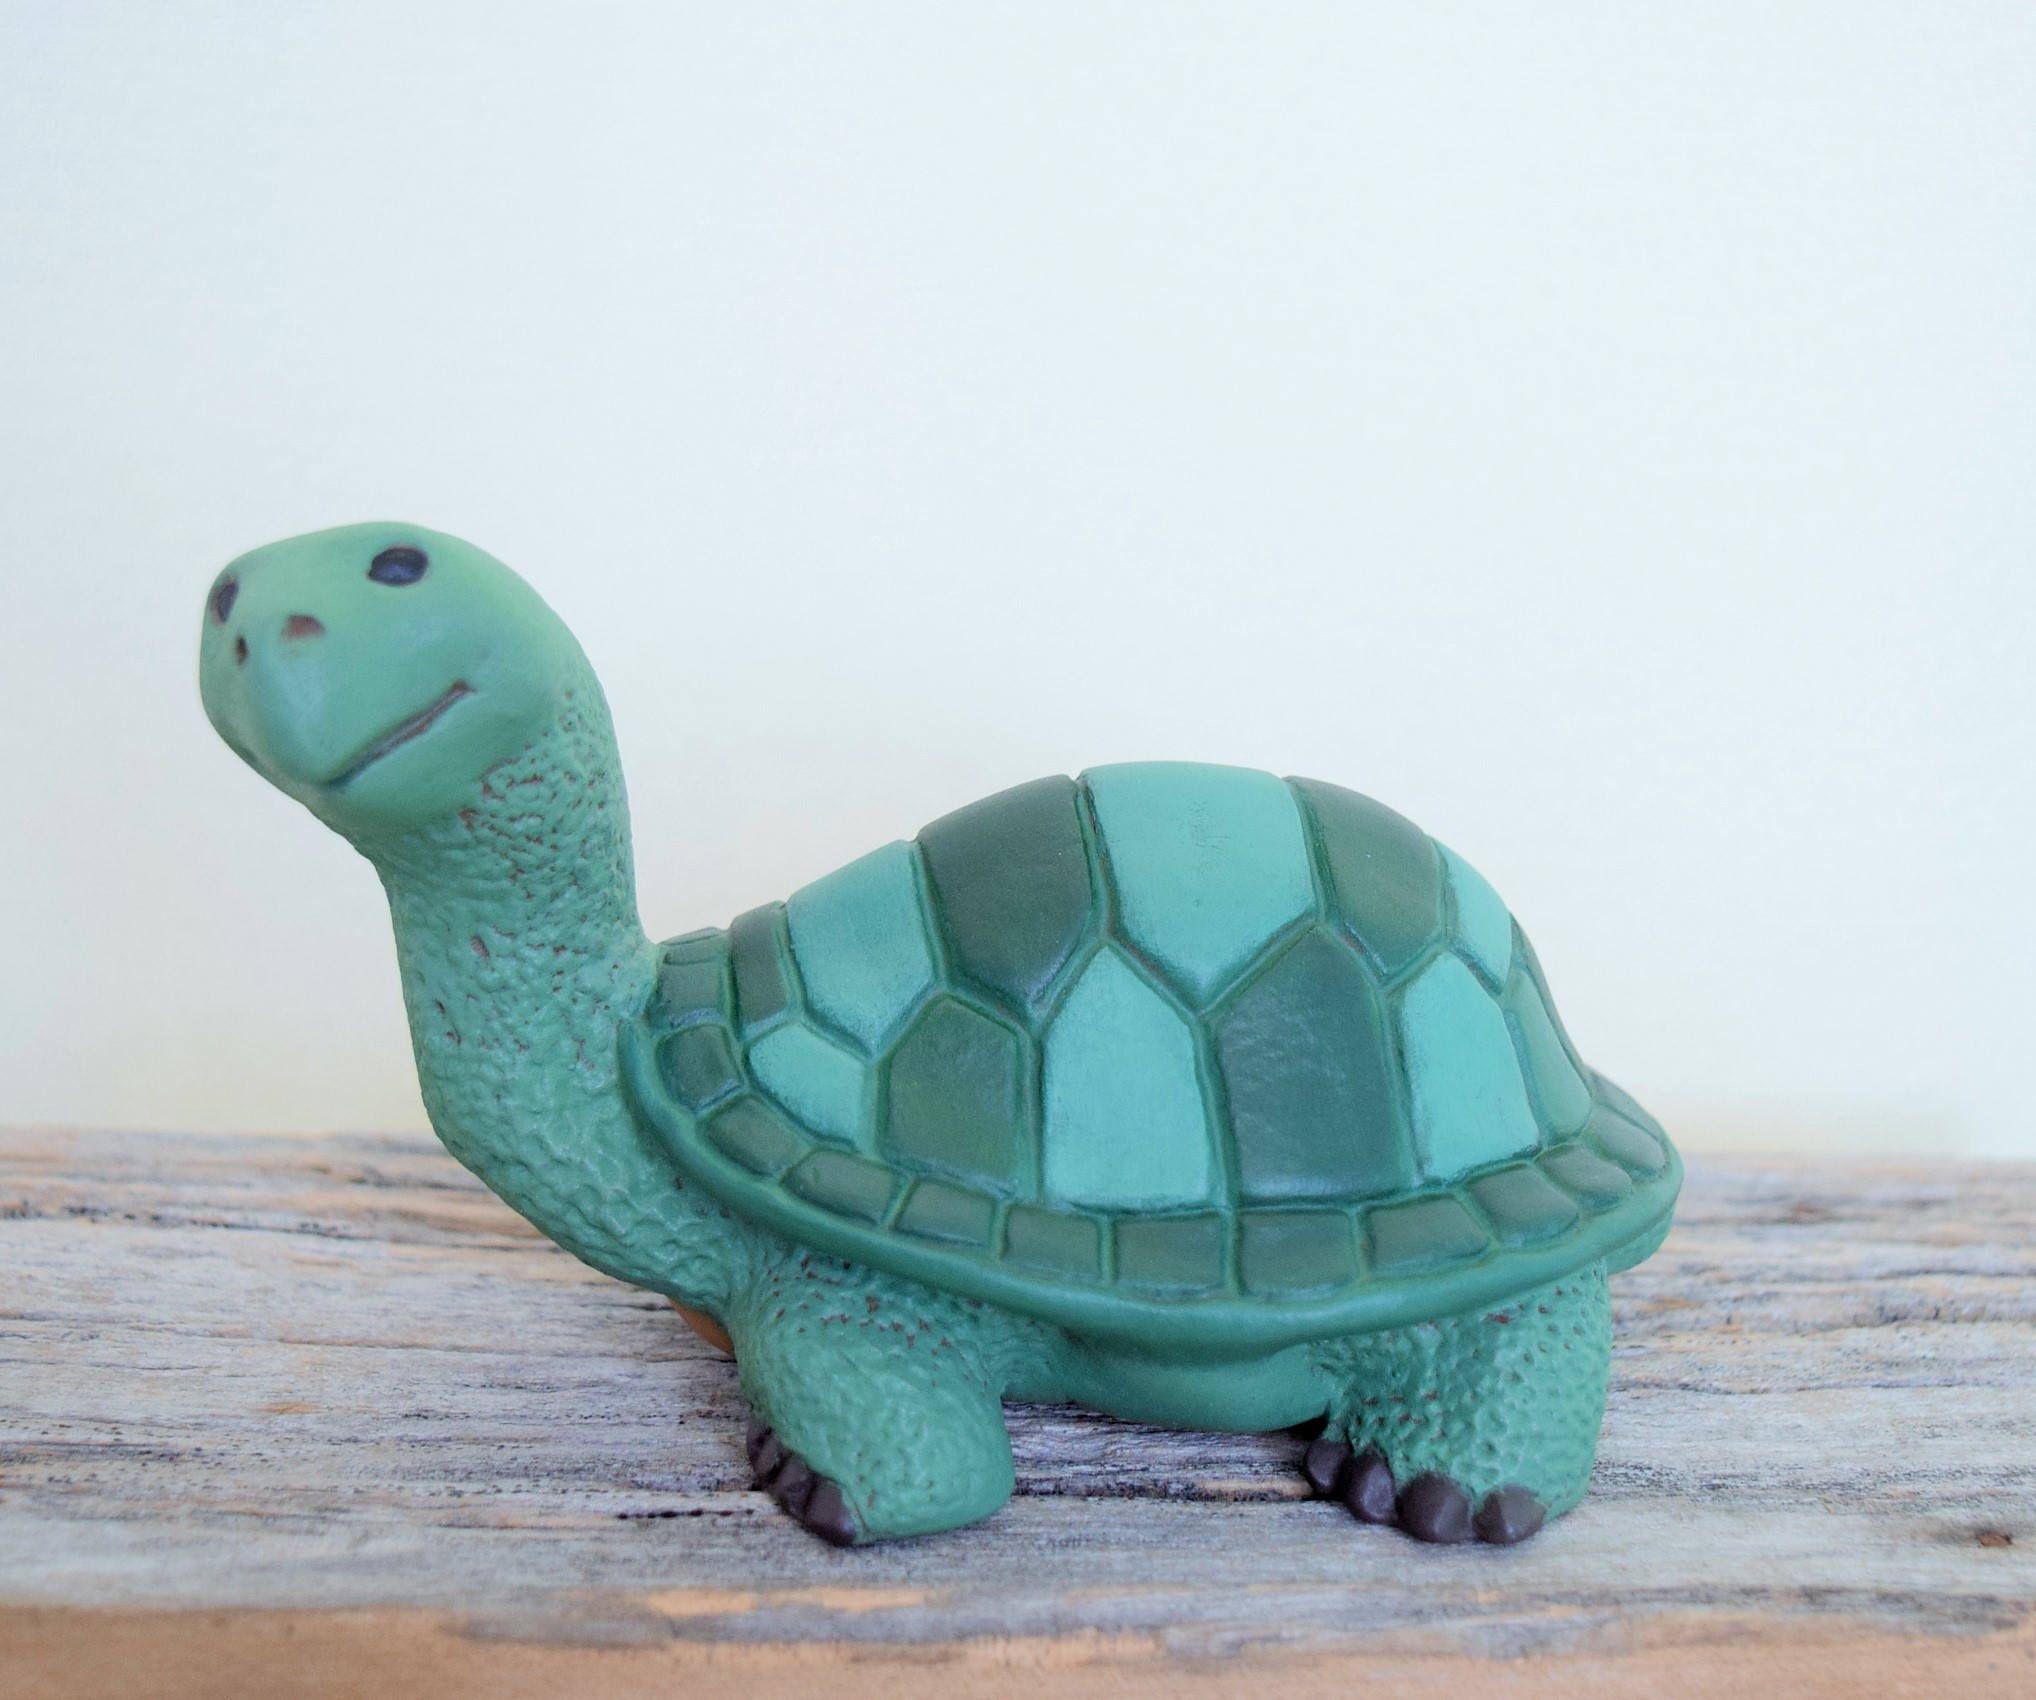 Ceramic Turtle Tortoise Painted Turtle Cute Turtle For Your Garden Yard Art Turtle Turtle Statue Ou Turtle Painting Ceramic Turtle Turtle Figurines